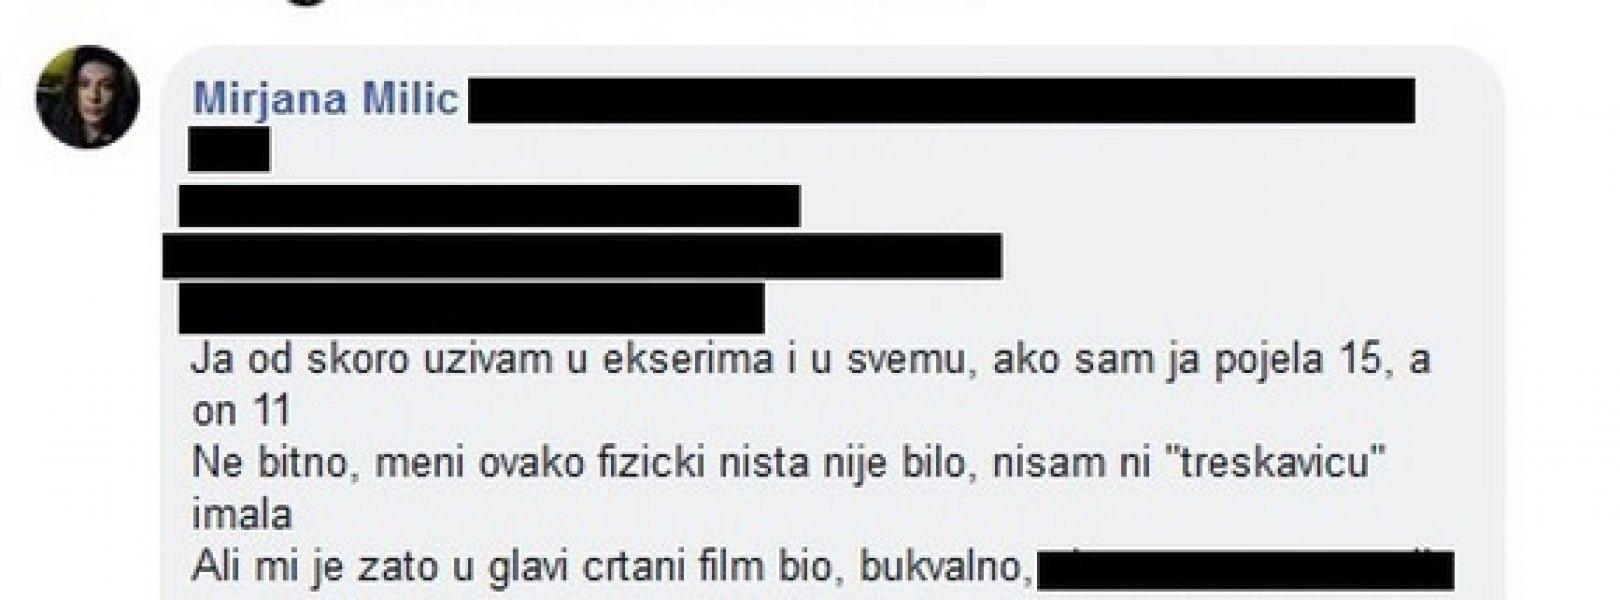 mirjana-milic-status-droga